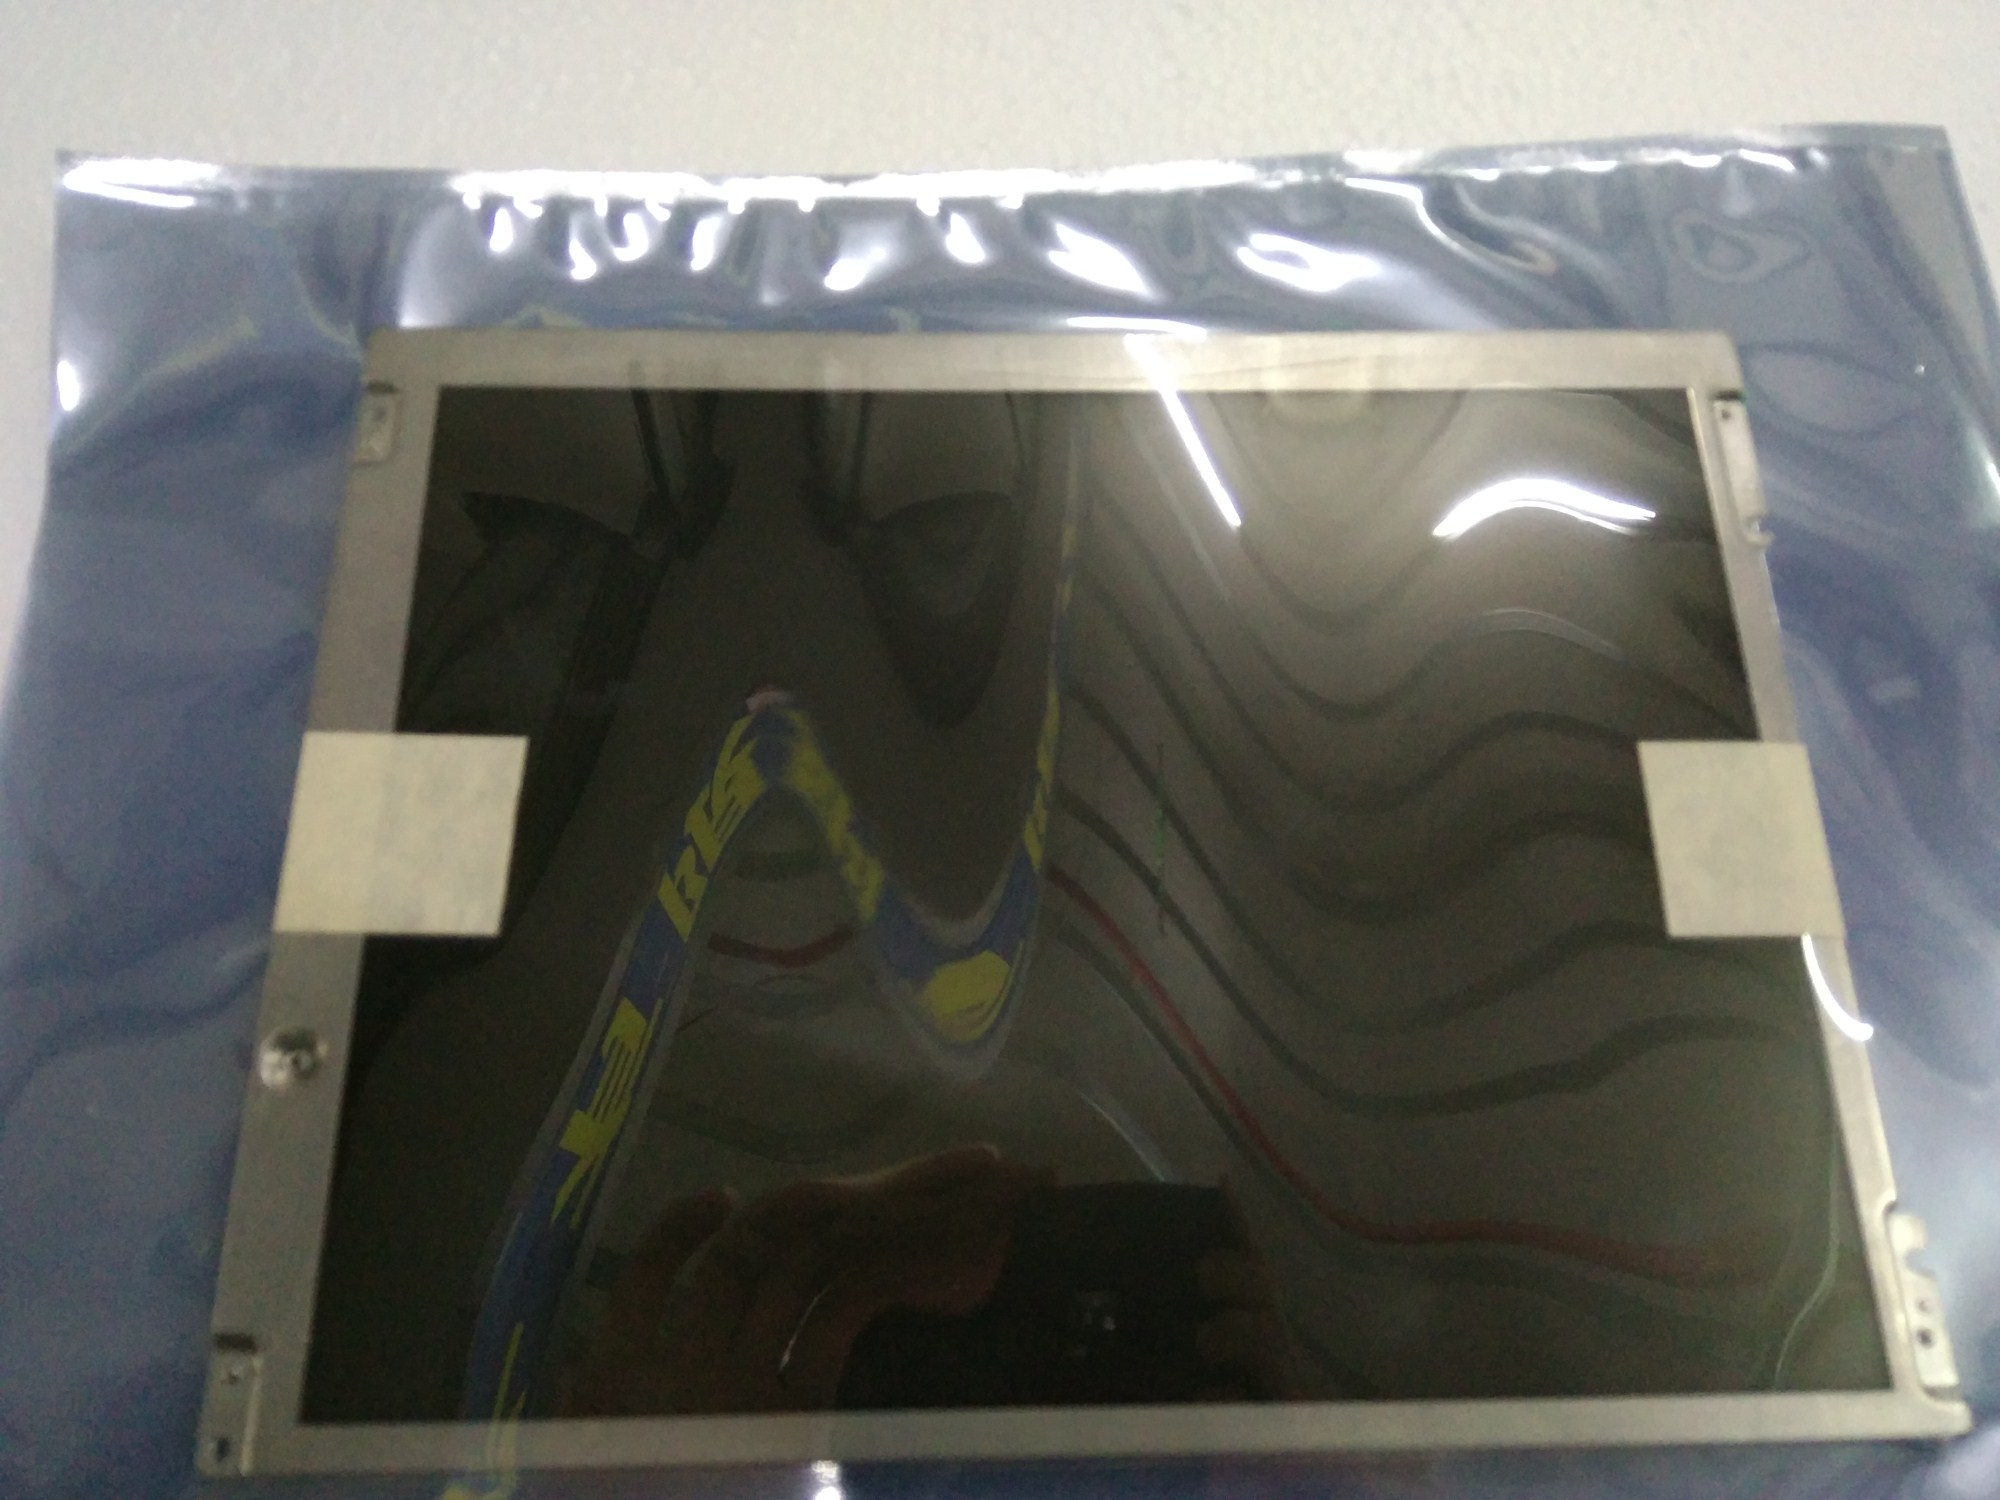 Industrial display LCD screen 12.1 inch Supply original G121SN01 V.2 industrial display lcd screen original 15 inch aa150xn04